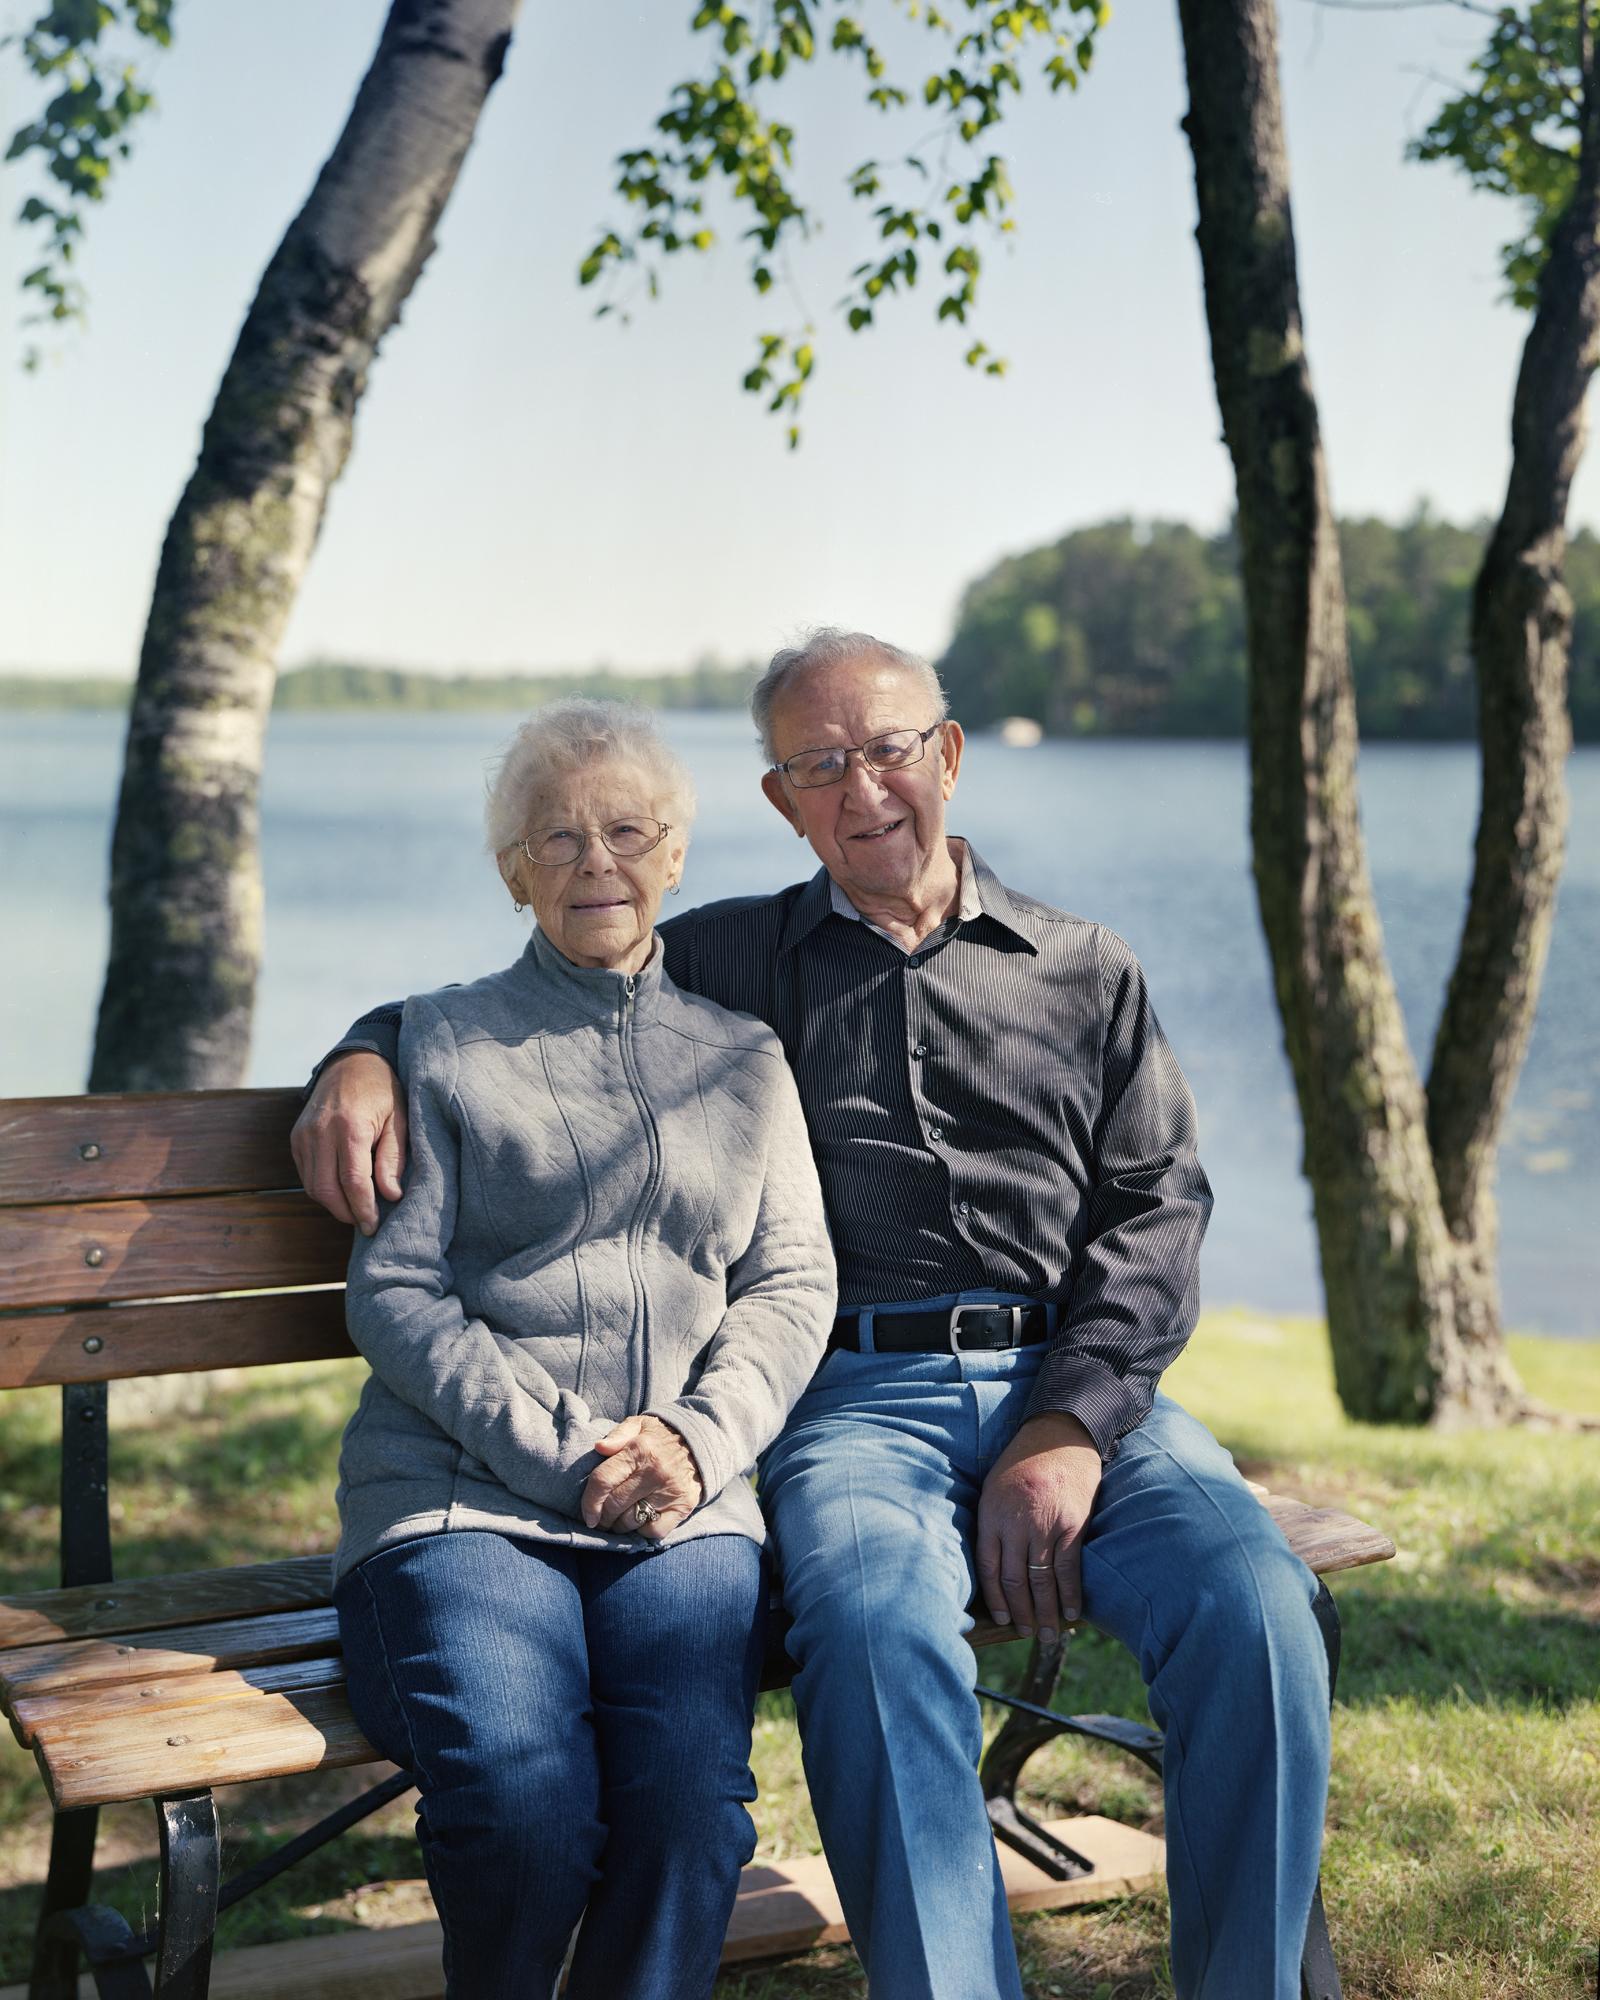 Grandma_Grandpa (3).jpg